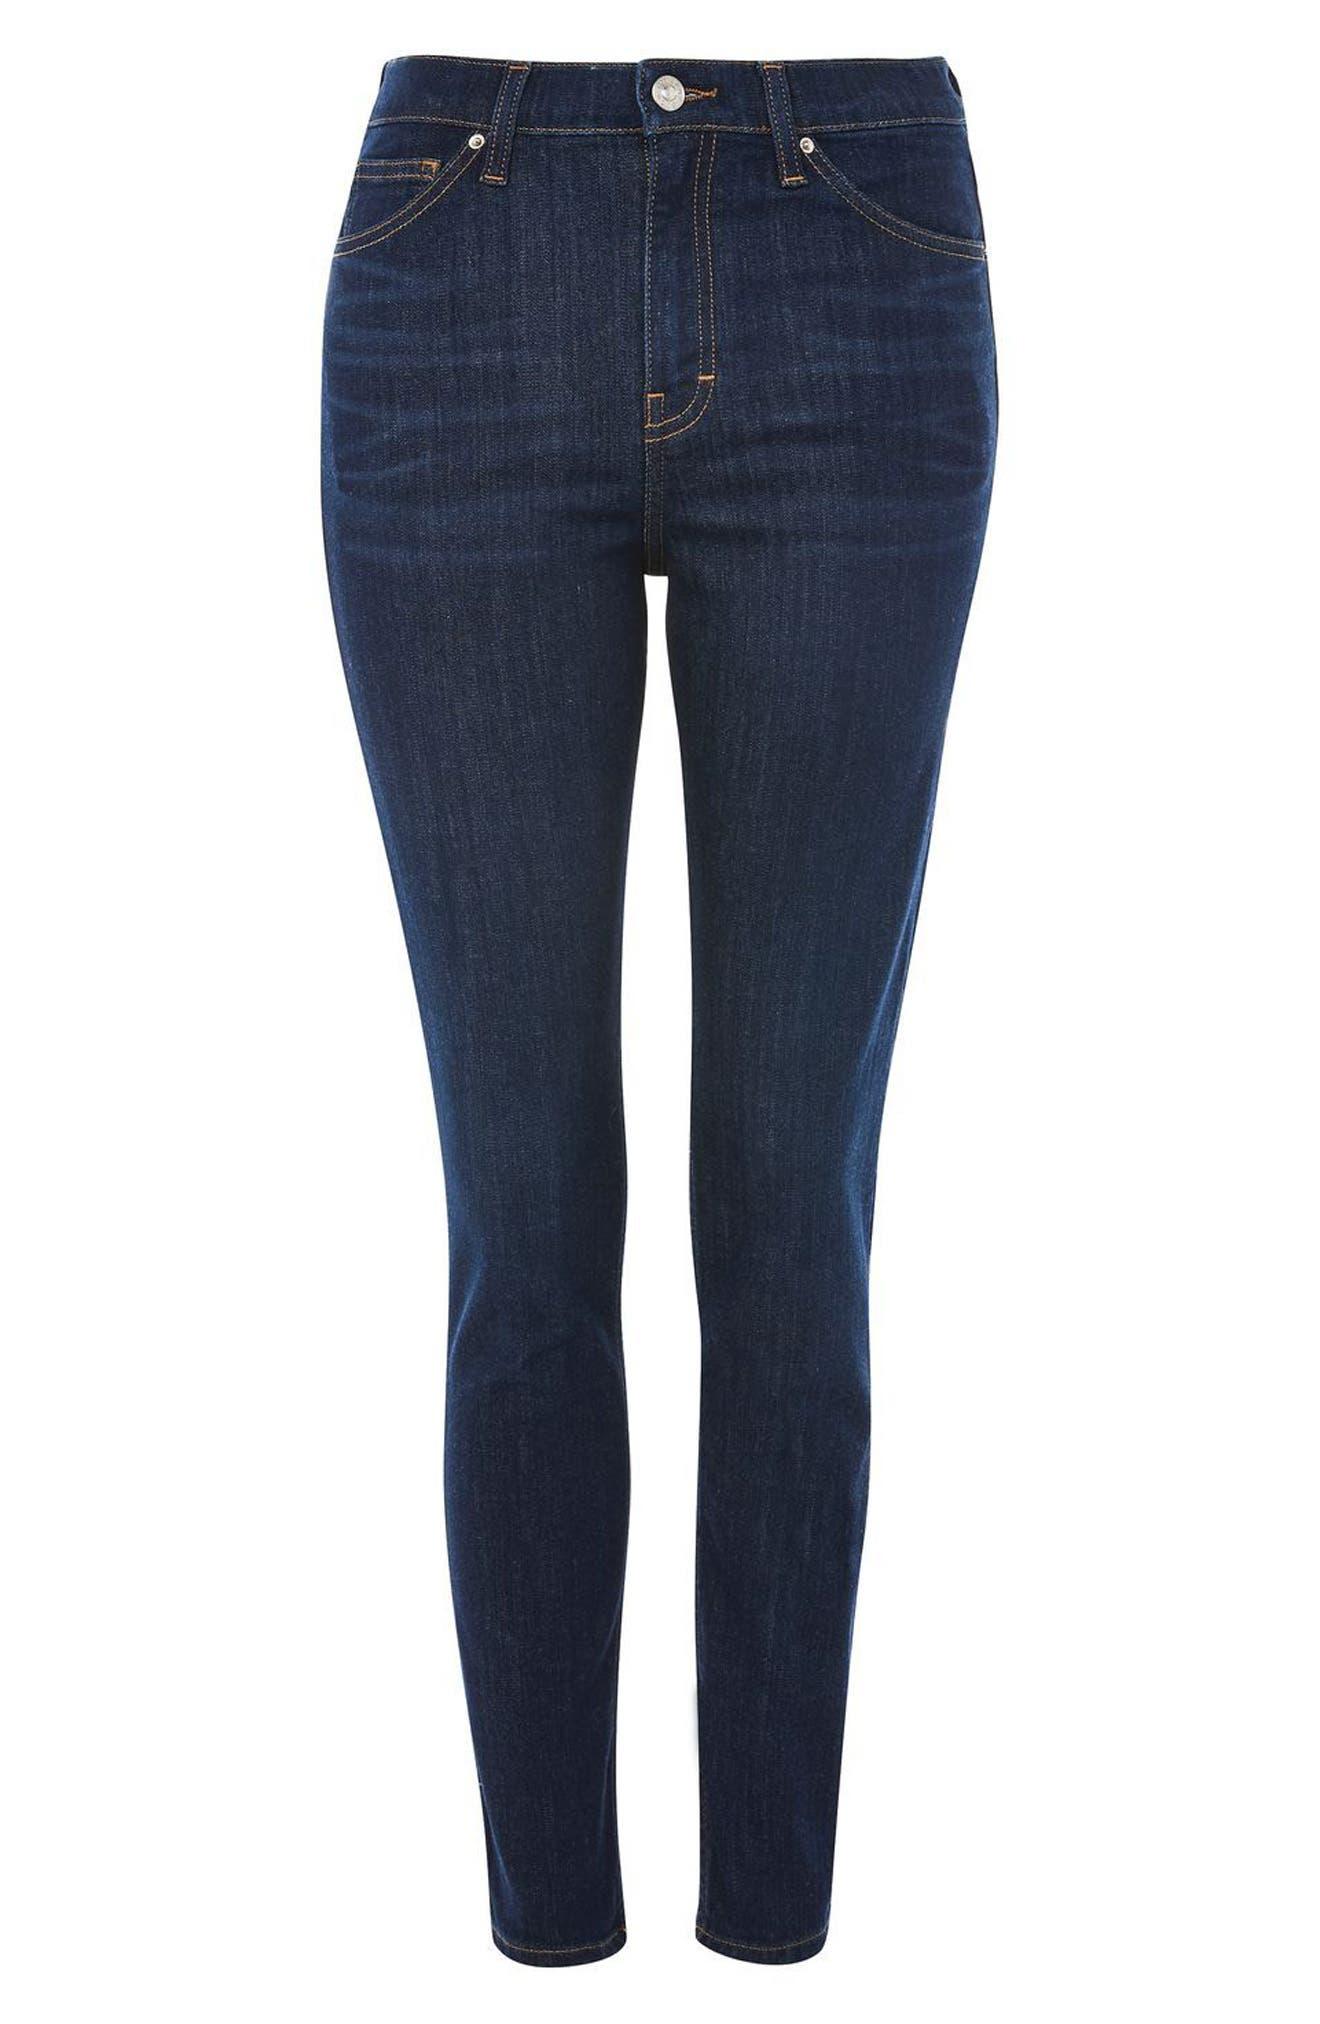 Jamie High Waist Ankle Skinny Jeans,                             Alternate thumbnail 4, color,                             Dark Denim